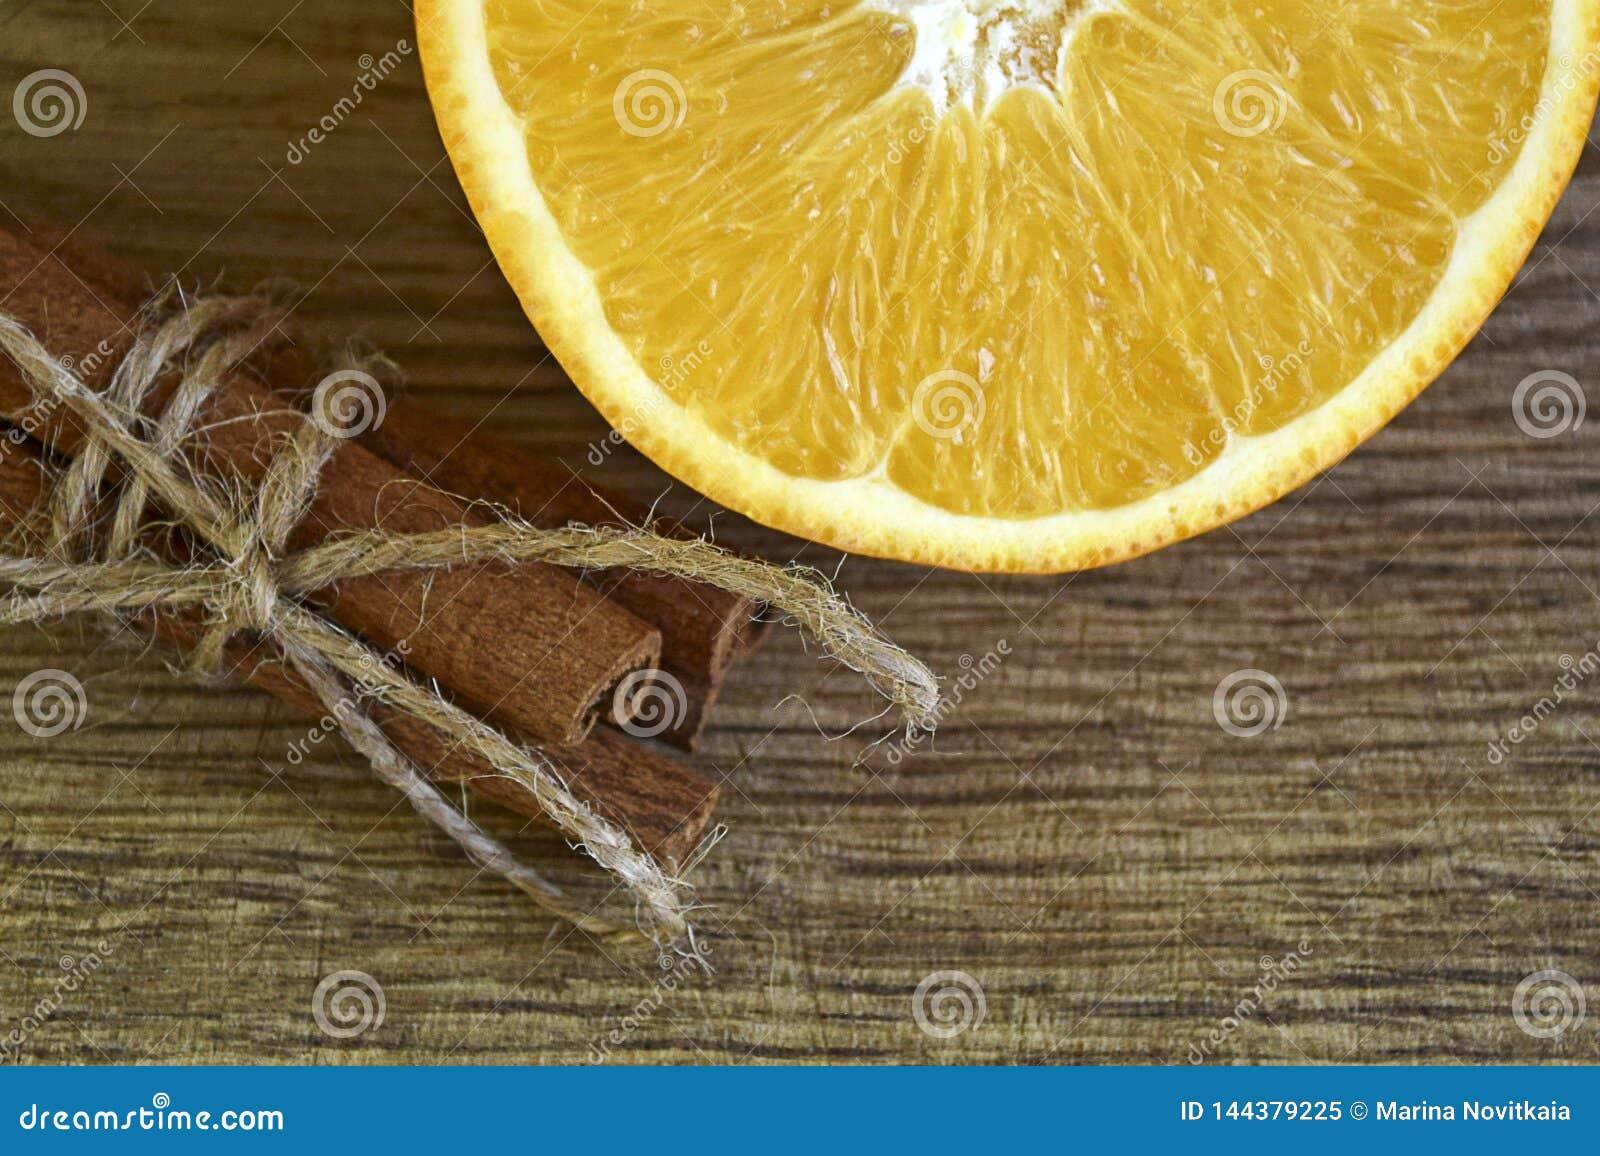 Gesneden verse sinaasappel en pijpjes kaneel